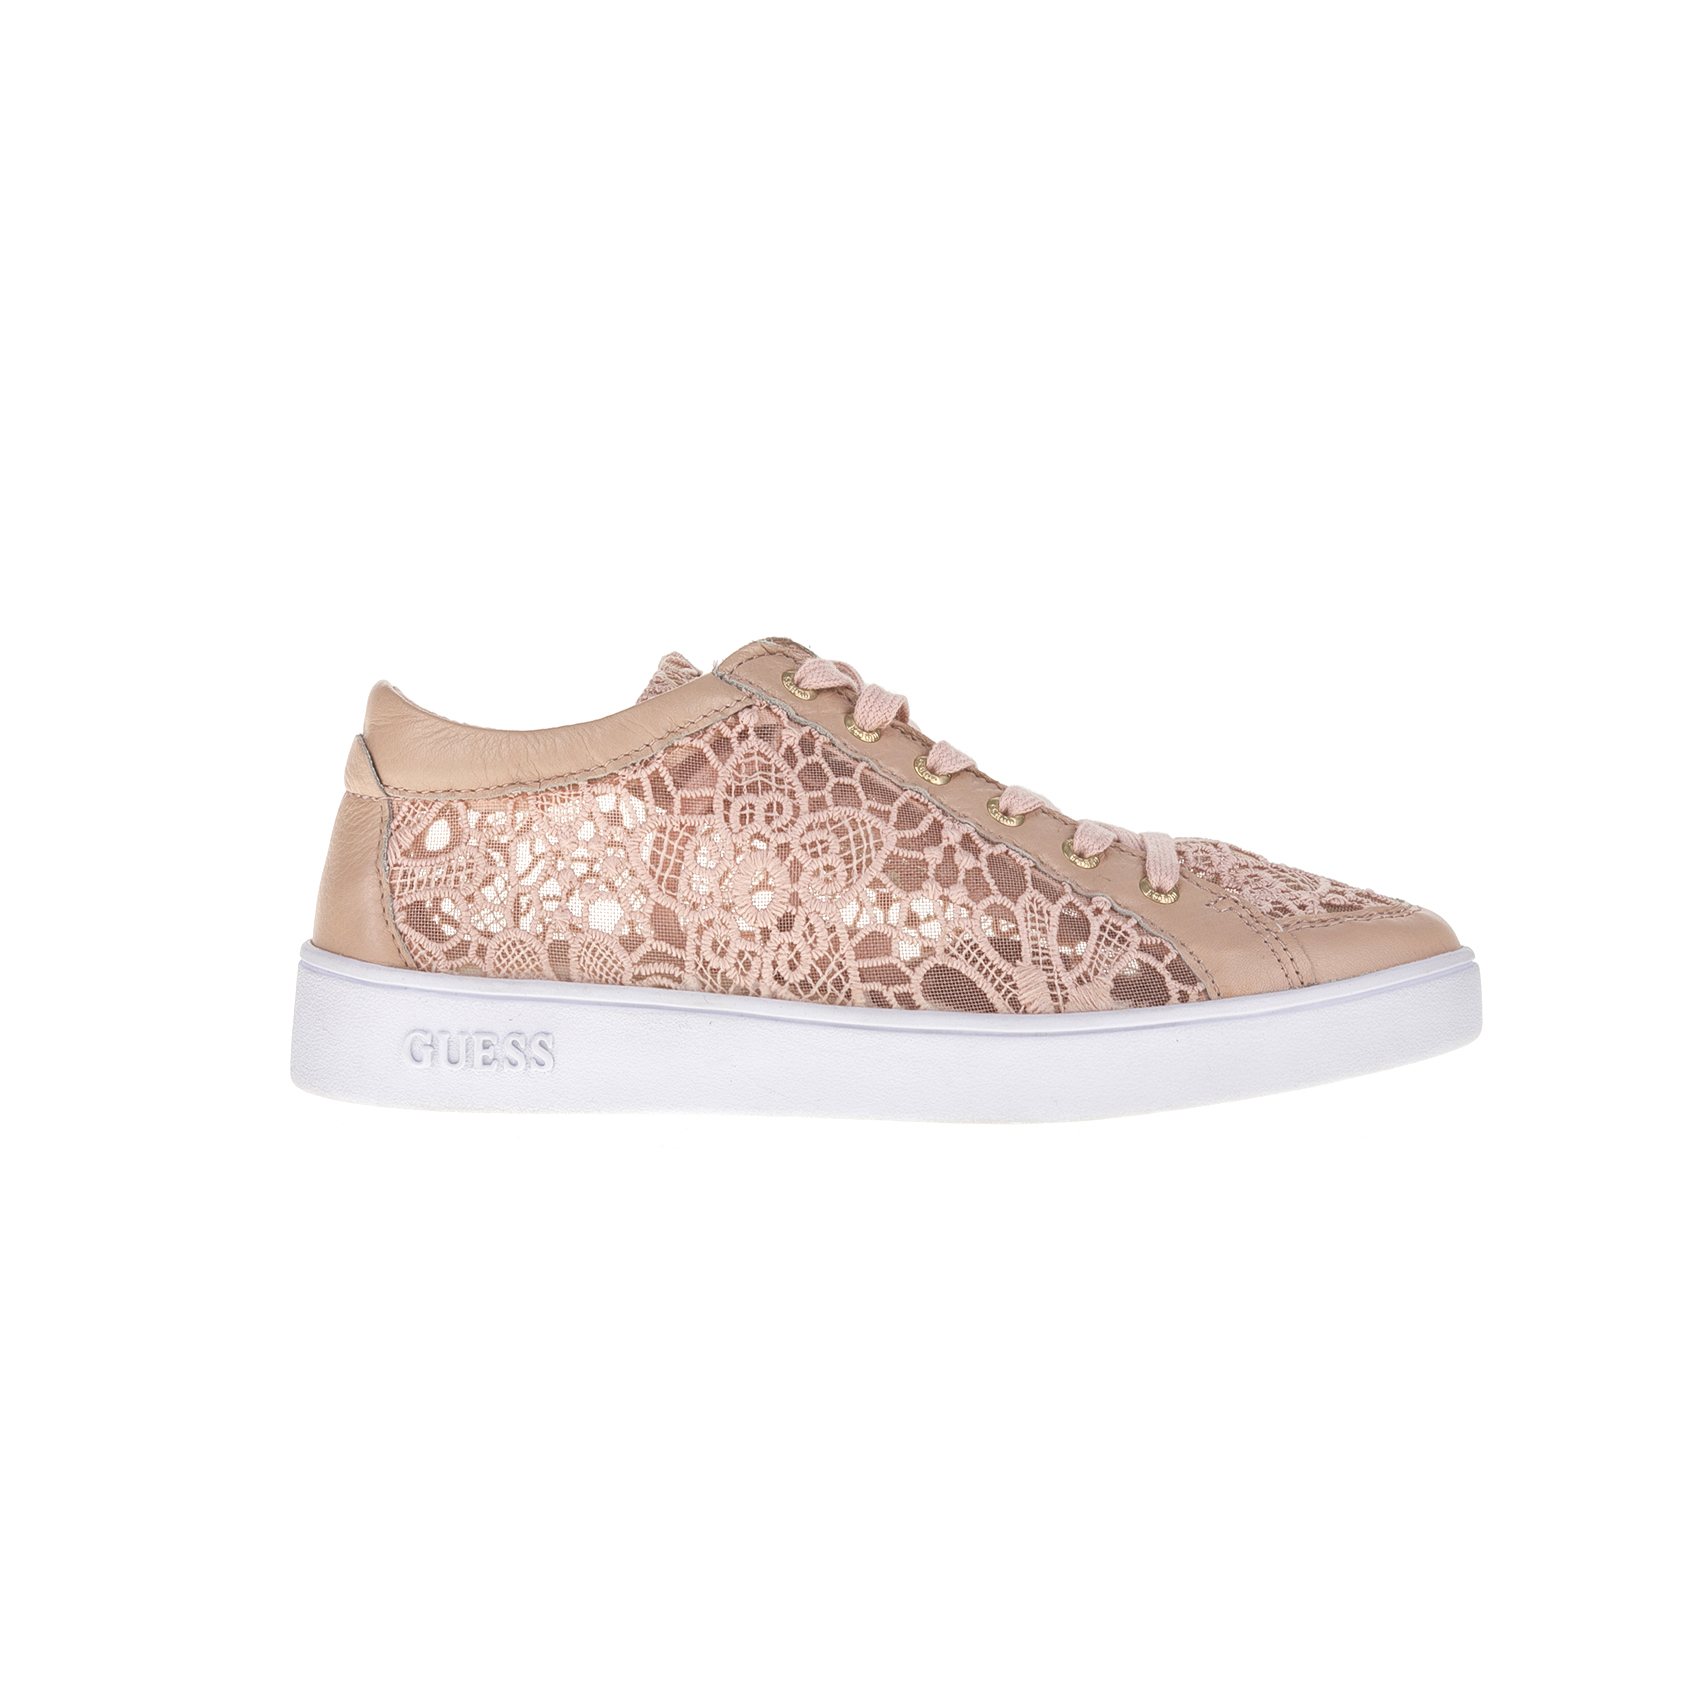 GUESS - Γυναικεία sneakers GUESS ροζ 0bc1689db3b